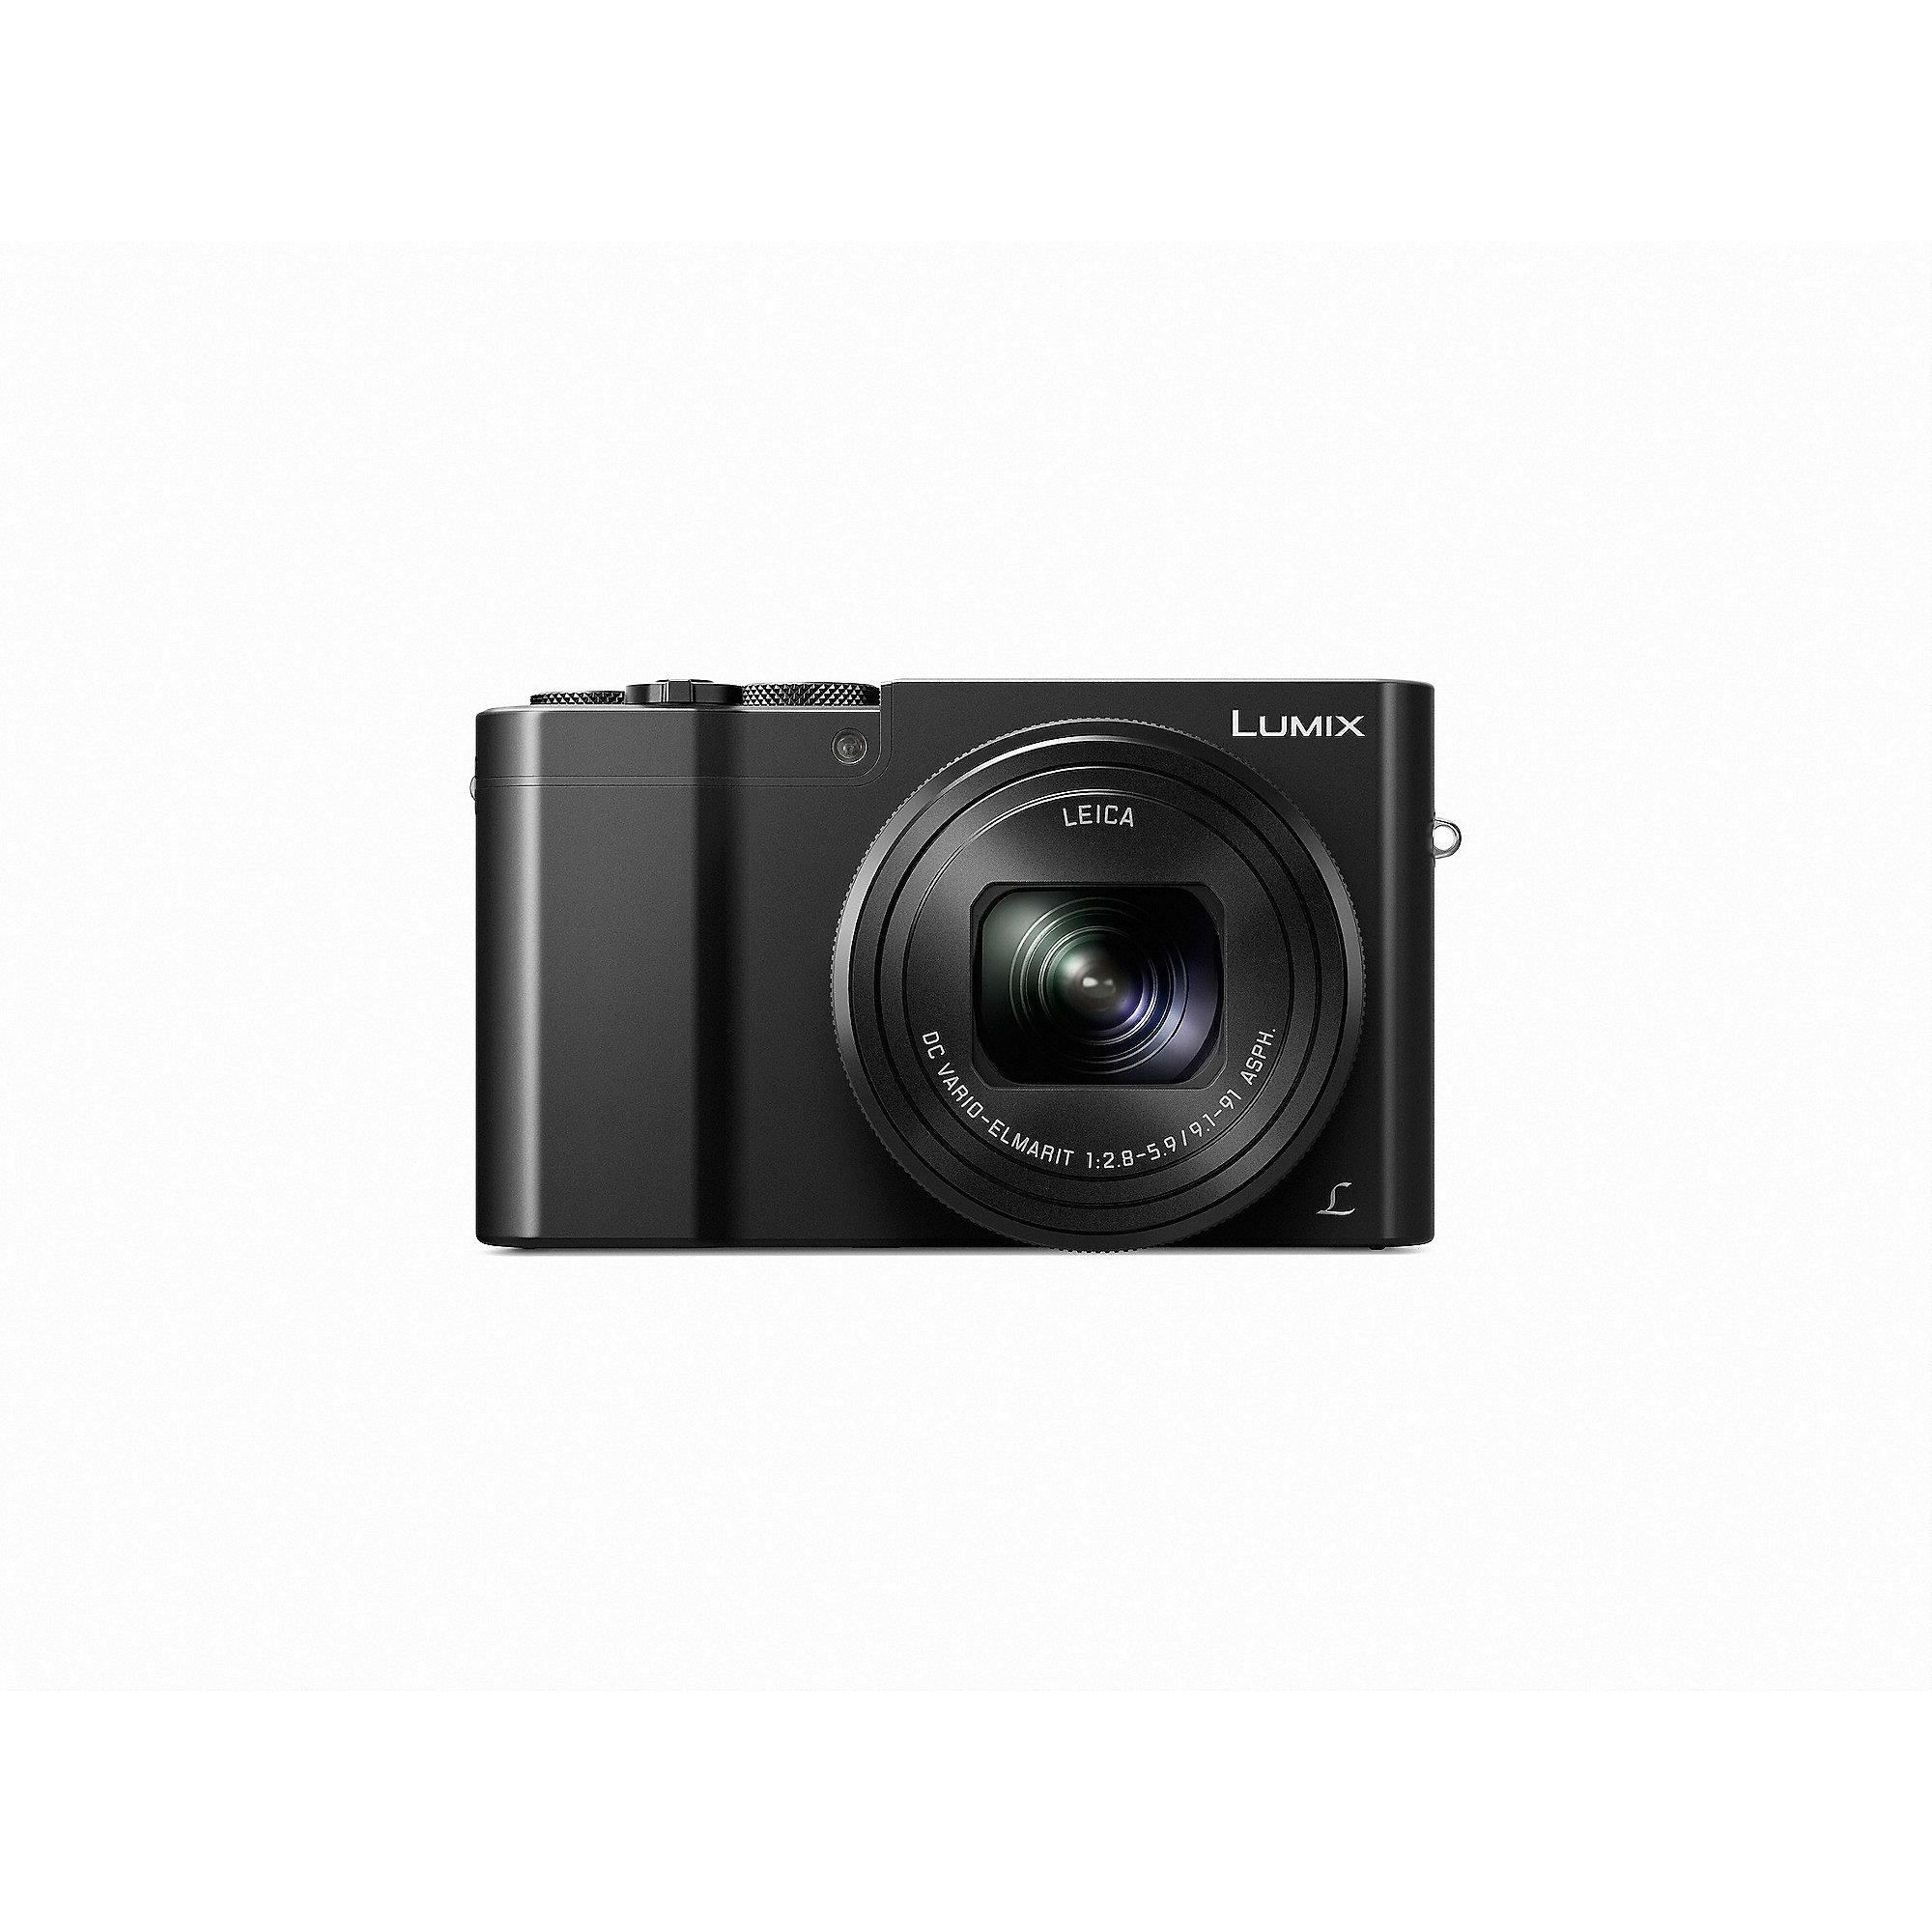 Panasonic Lumix DMC-TZ101 Reisezoom-Kamera schwarz ...